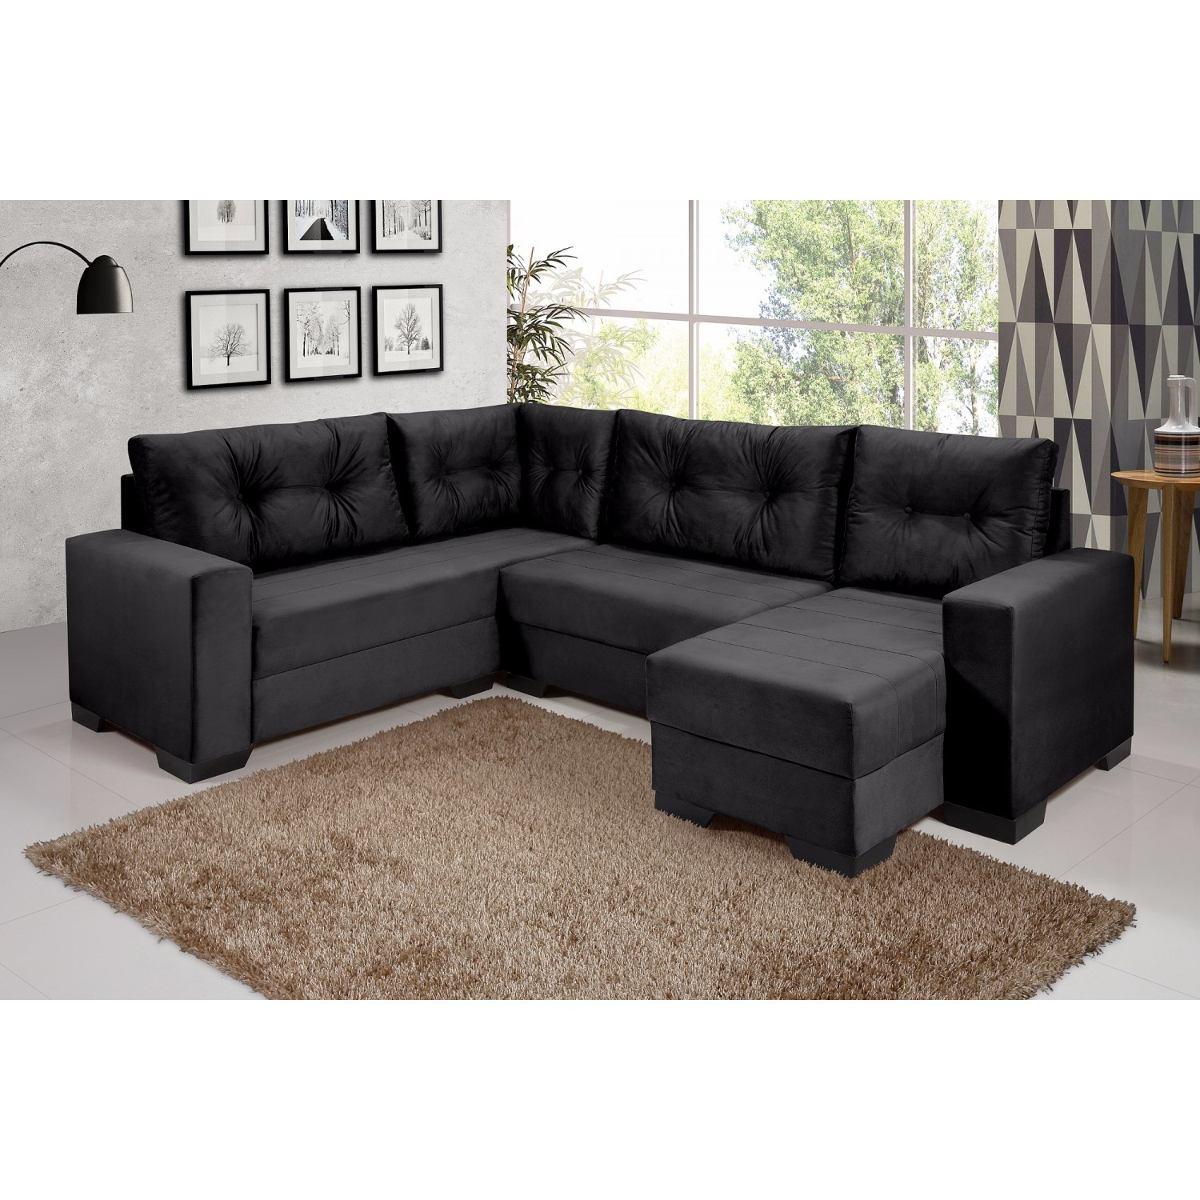 Sofa 5 Lugares Chaise